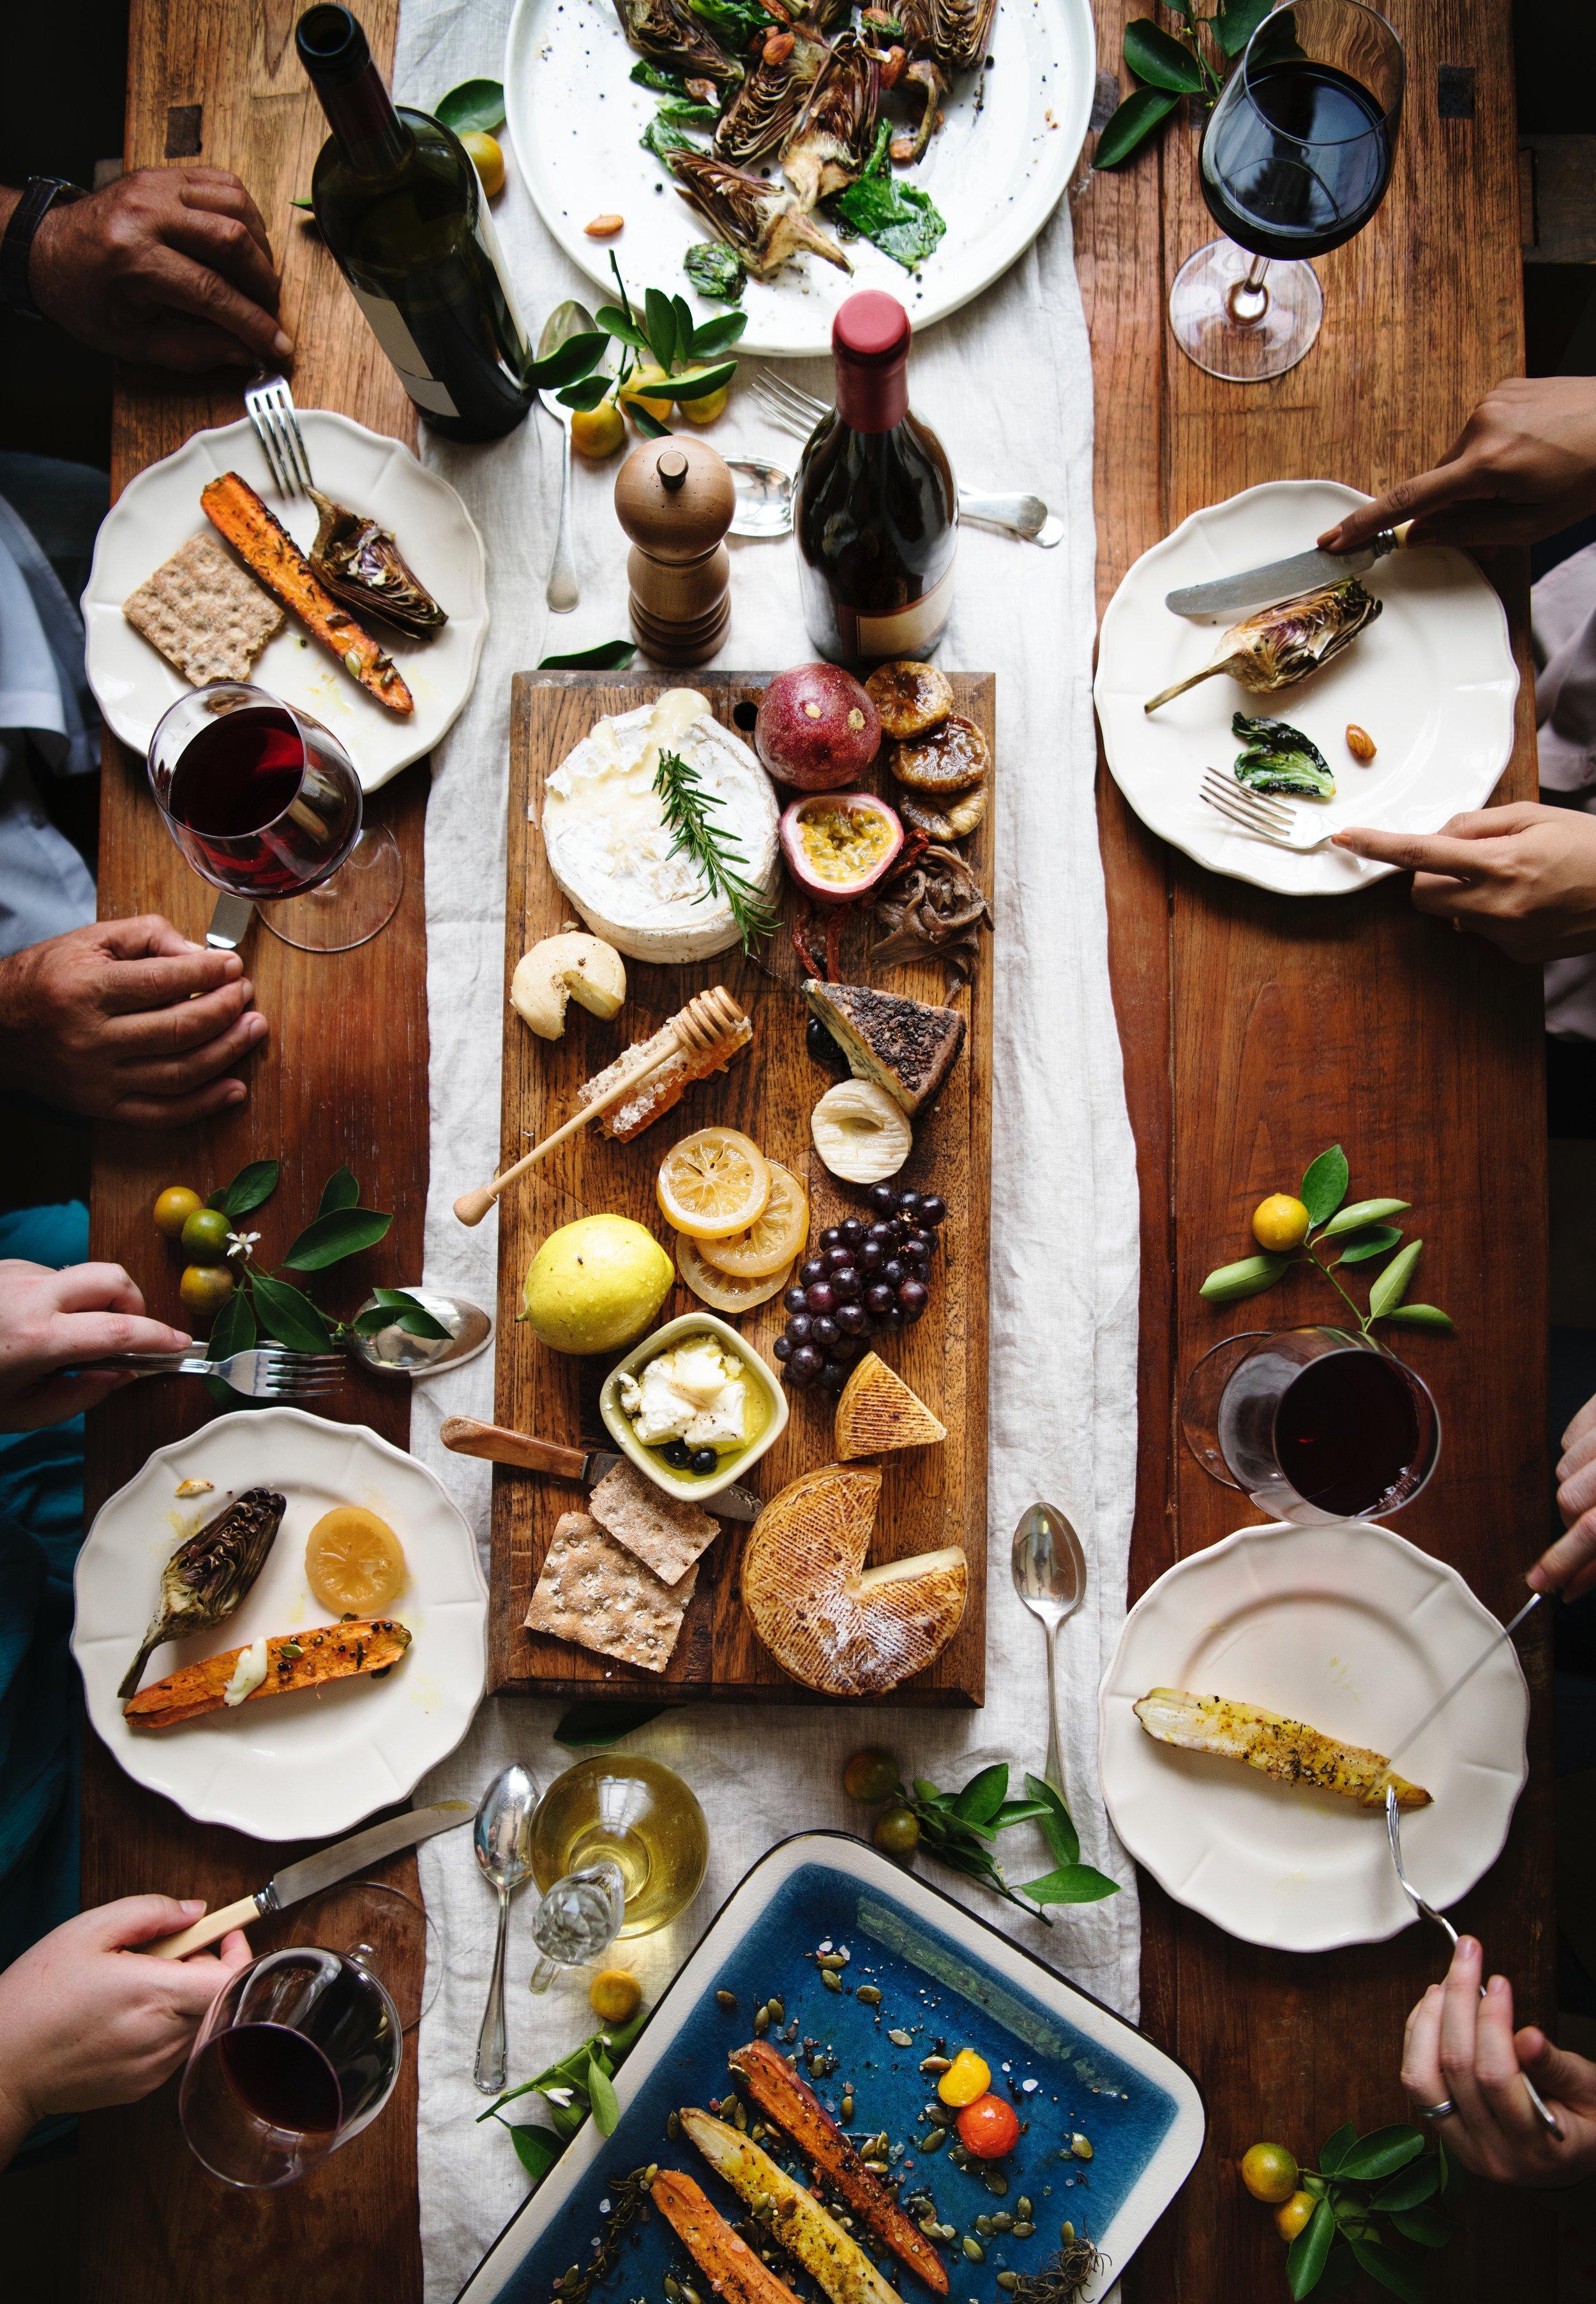 bread-cheese-cheese-platter-1893609 (1).jpg